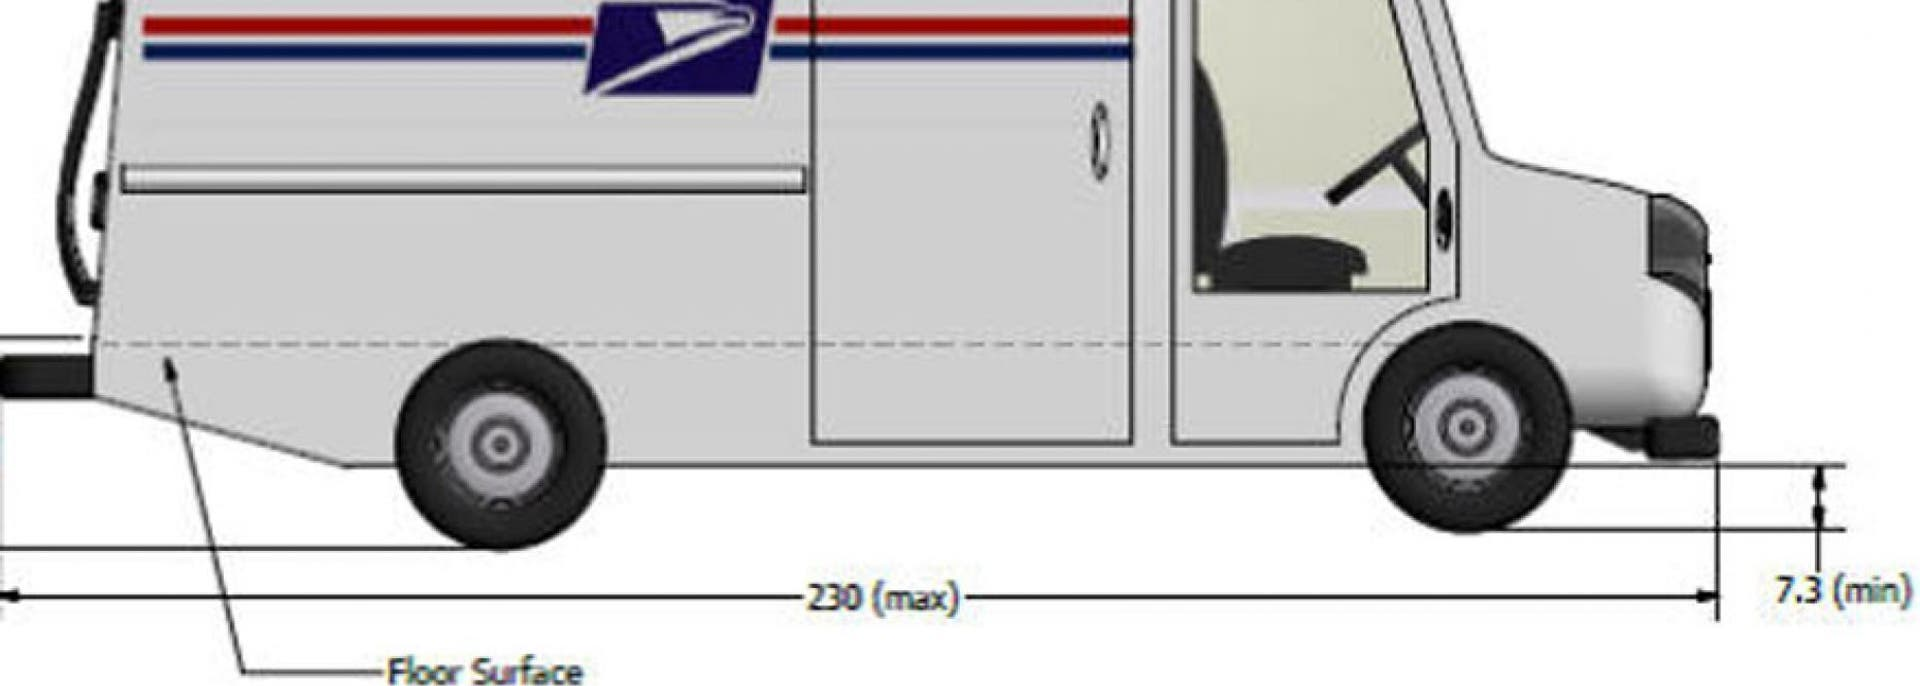 New U S Postal Service Truck Contract Worth 6 3 Billion May Be